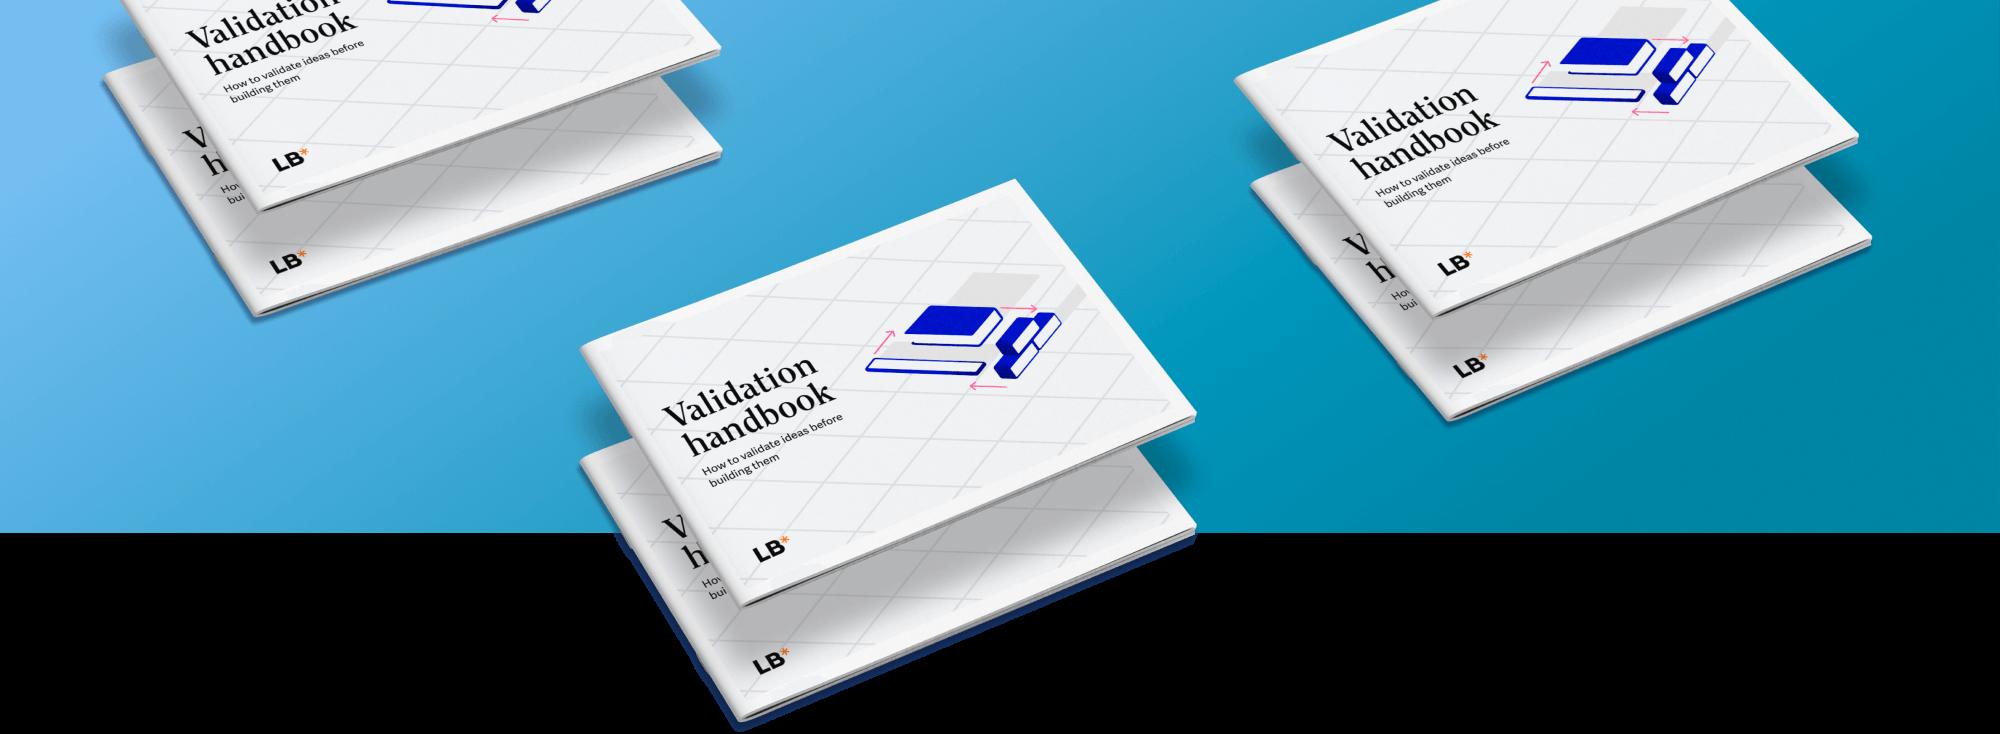 Validation Handbook